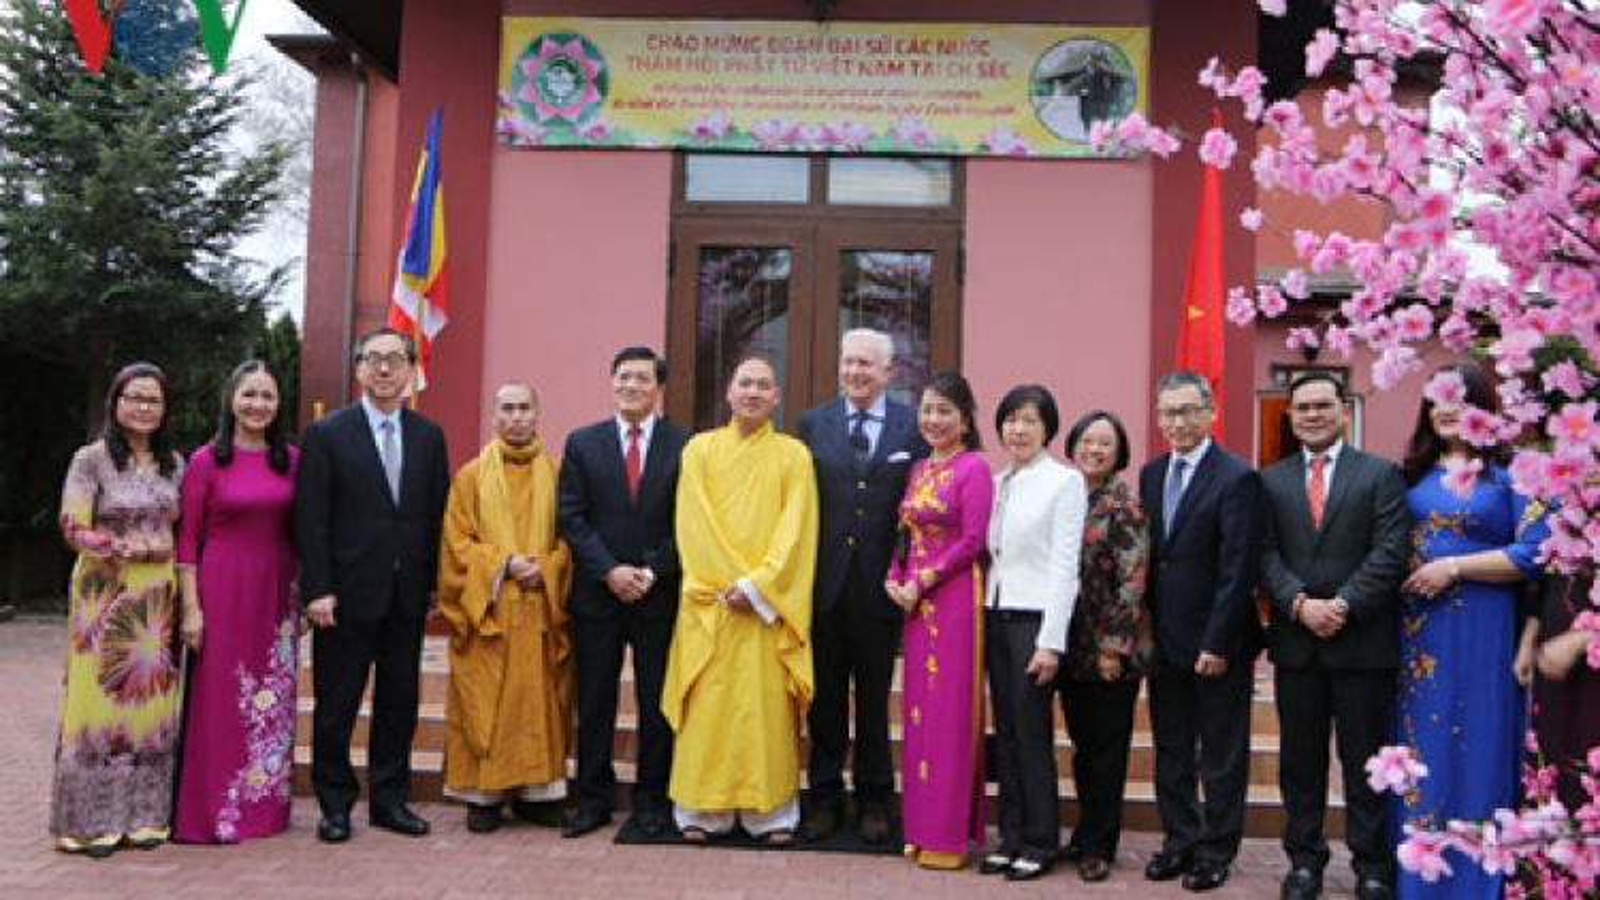 Ambassadors in Czech learn about Vietnamese culture